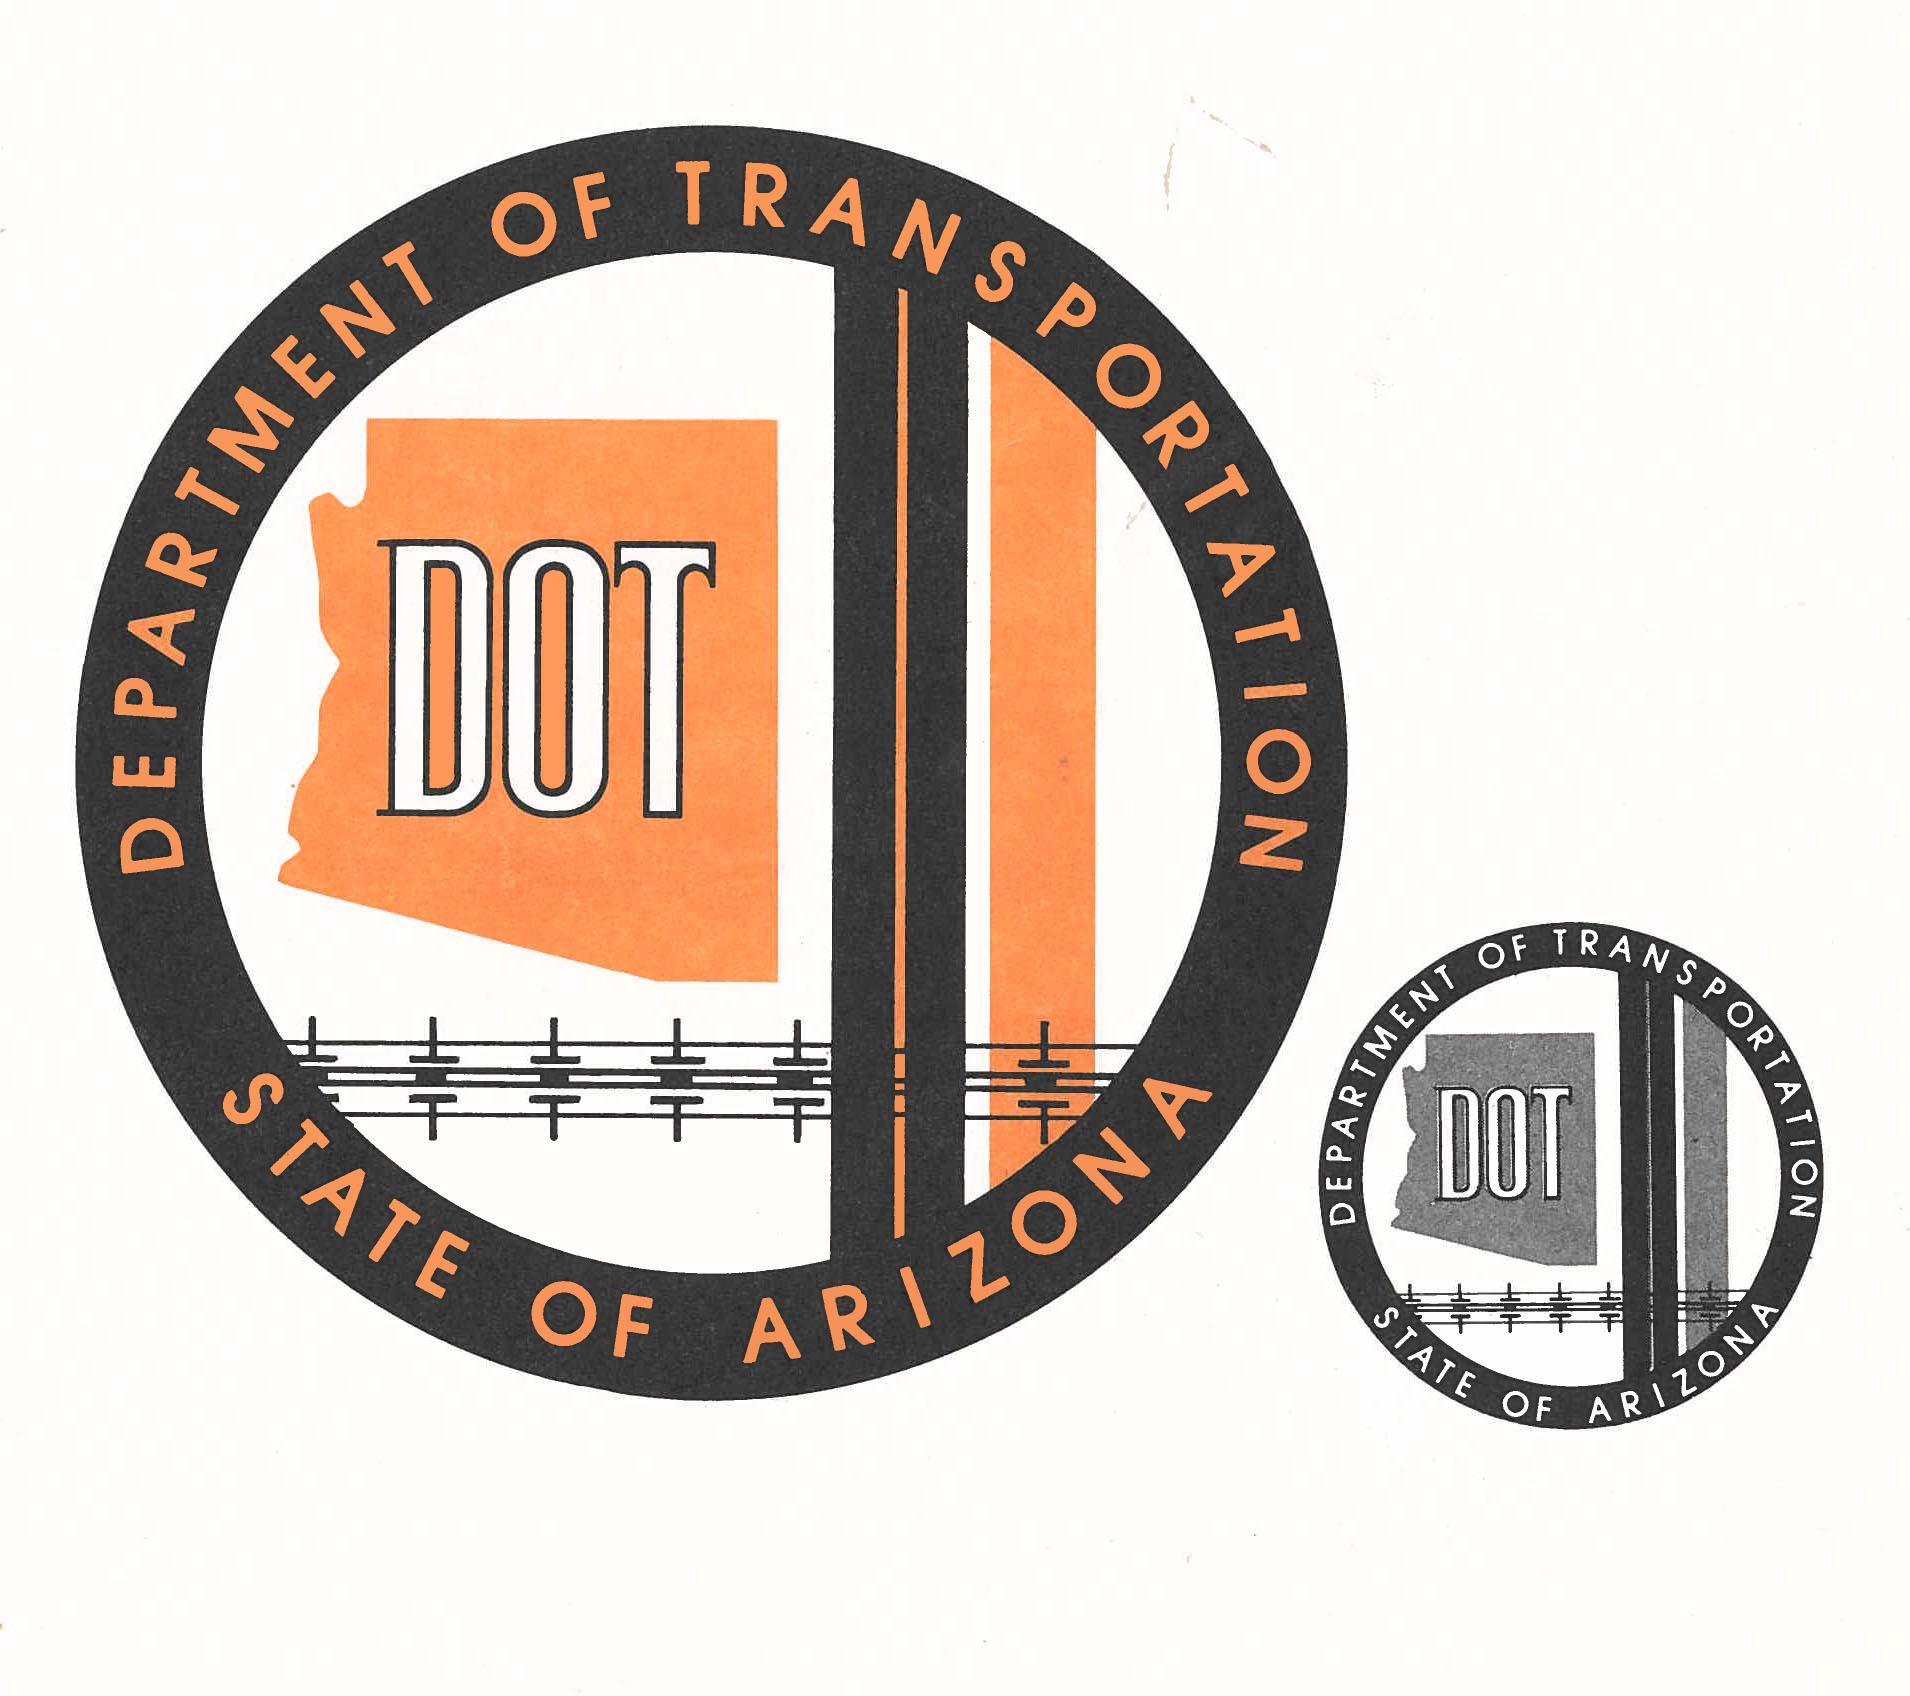 Logo 1974-1995